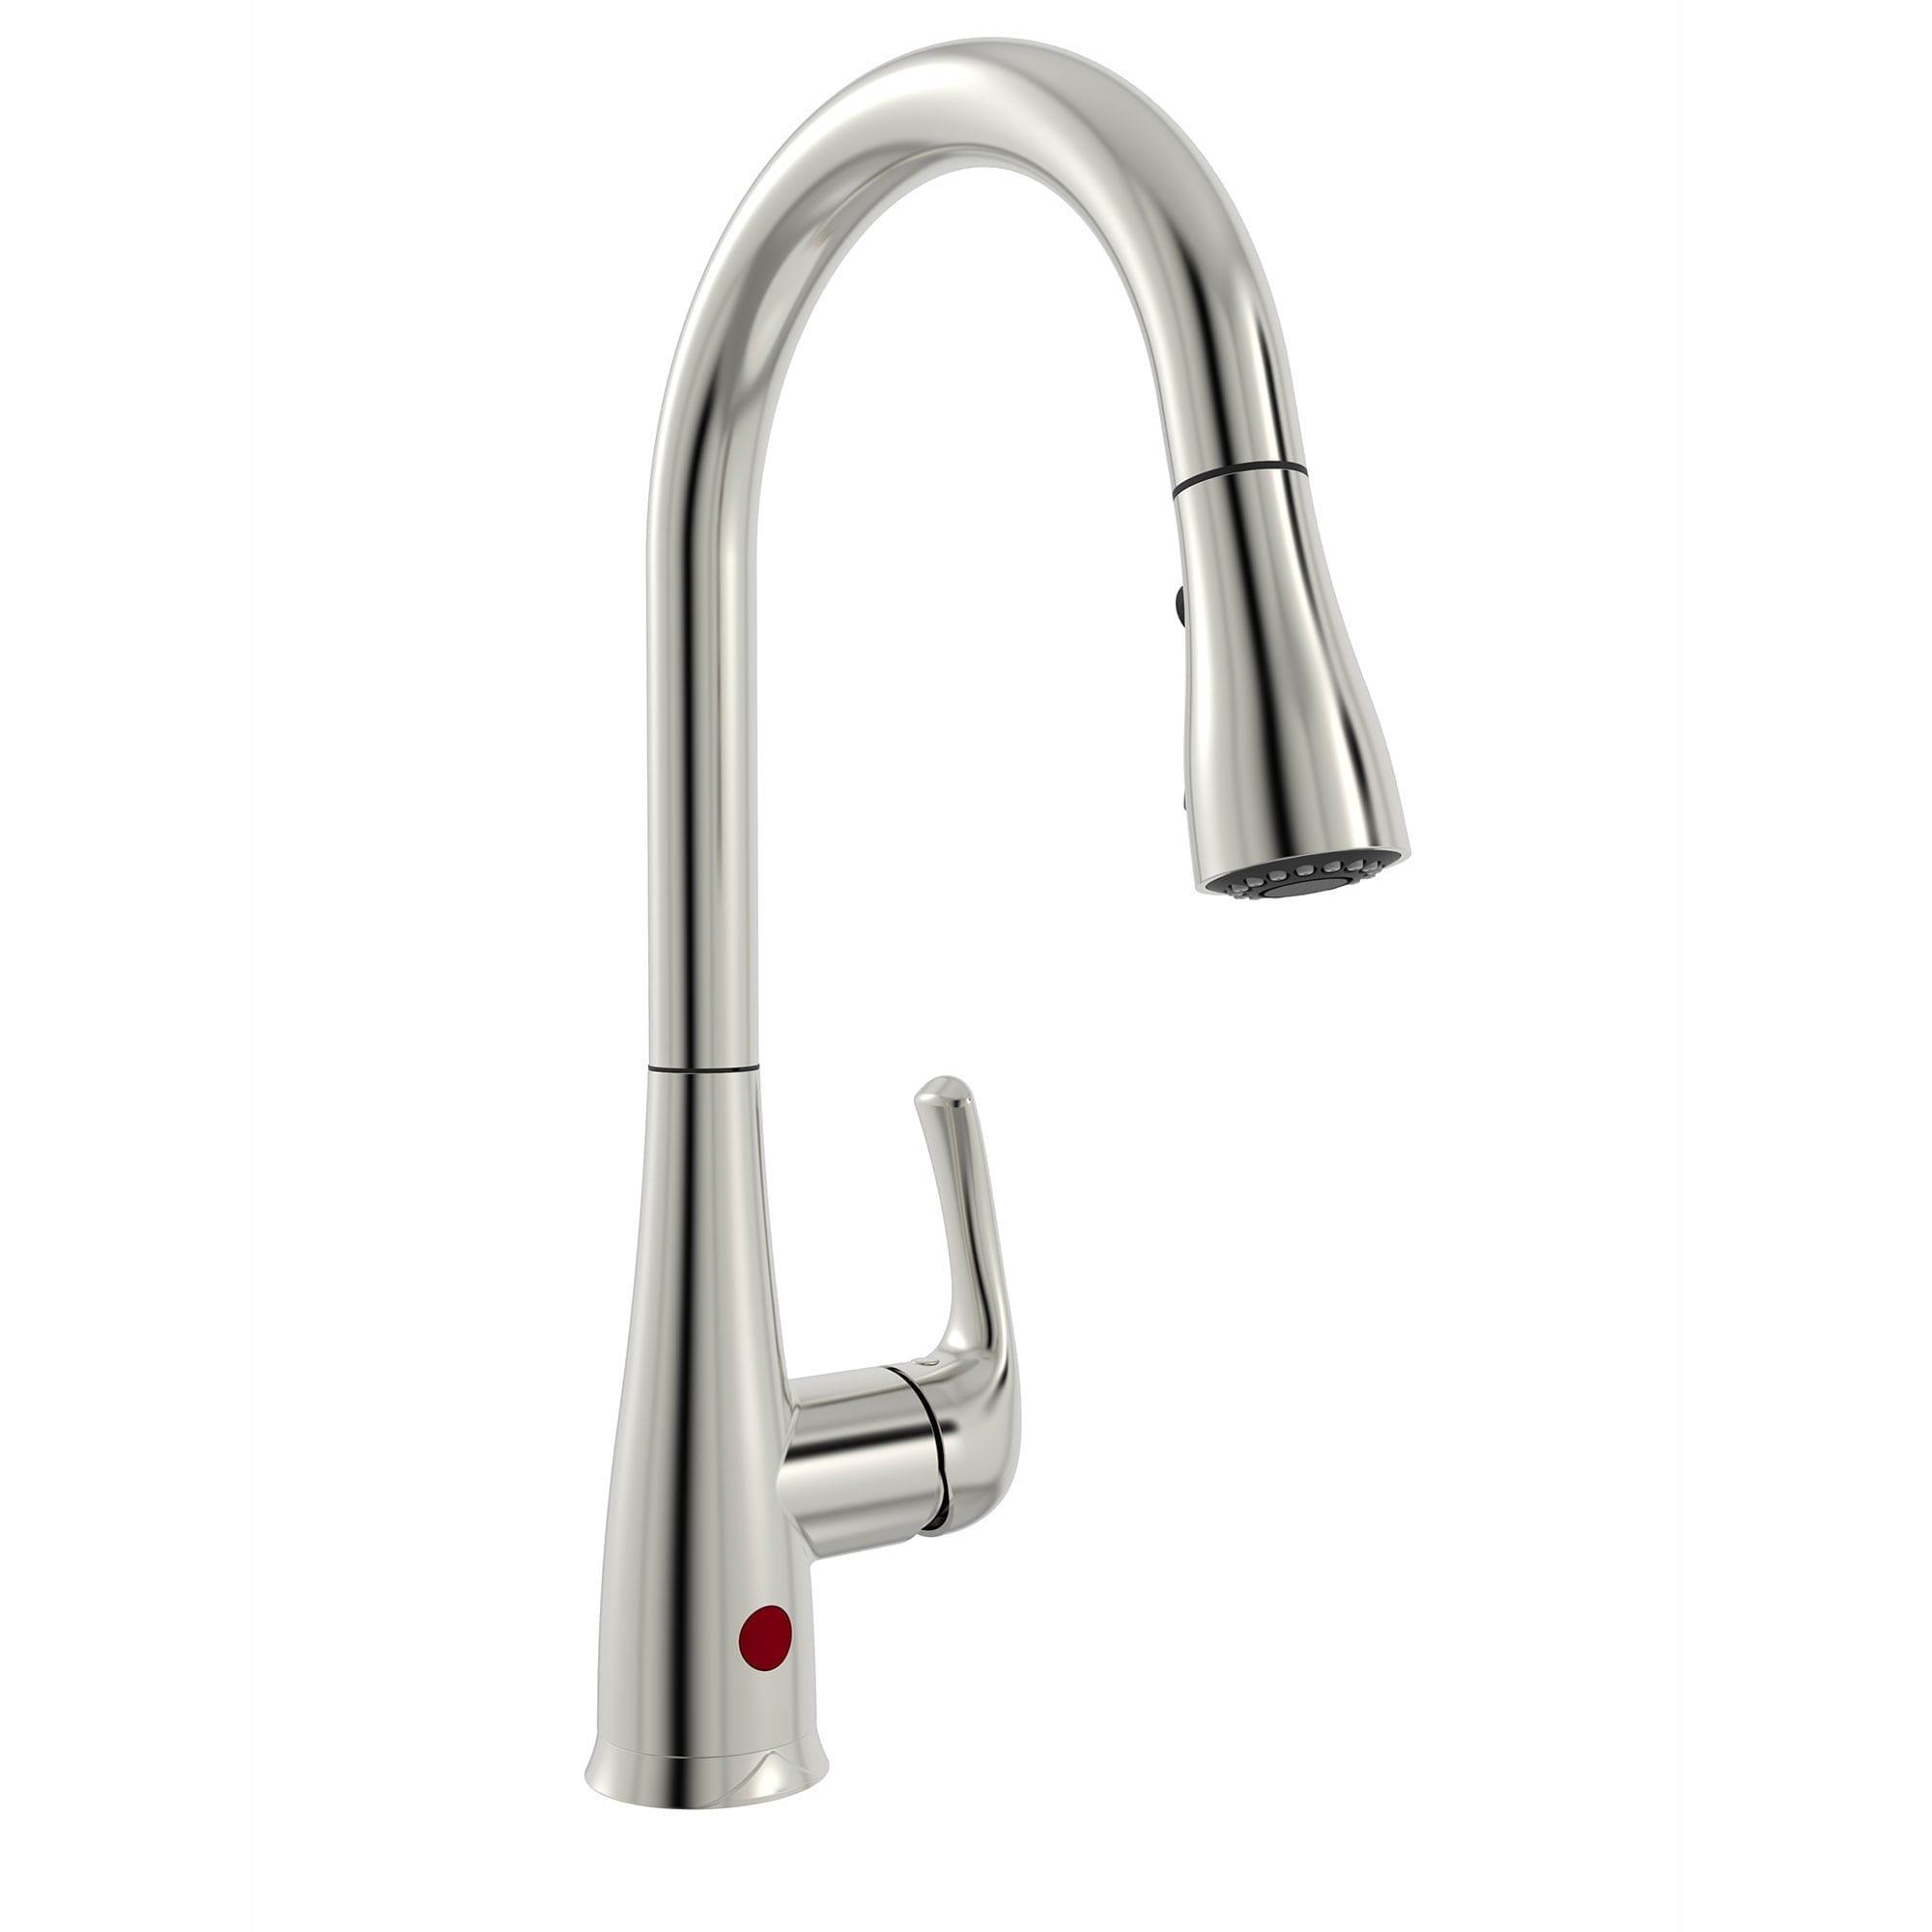 Kitchen Sink Faucet with Movement Sensor, Pull-Down Spout - Bélanger UPT